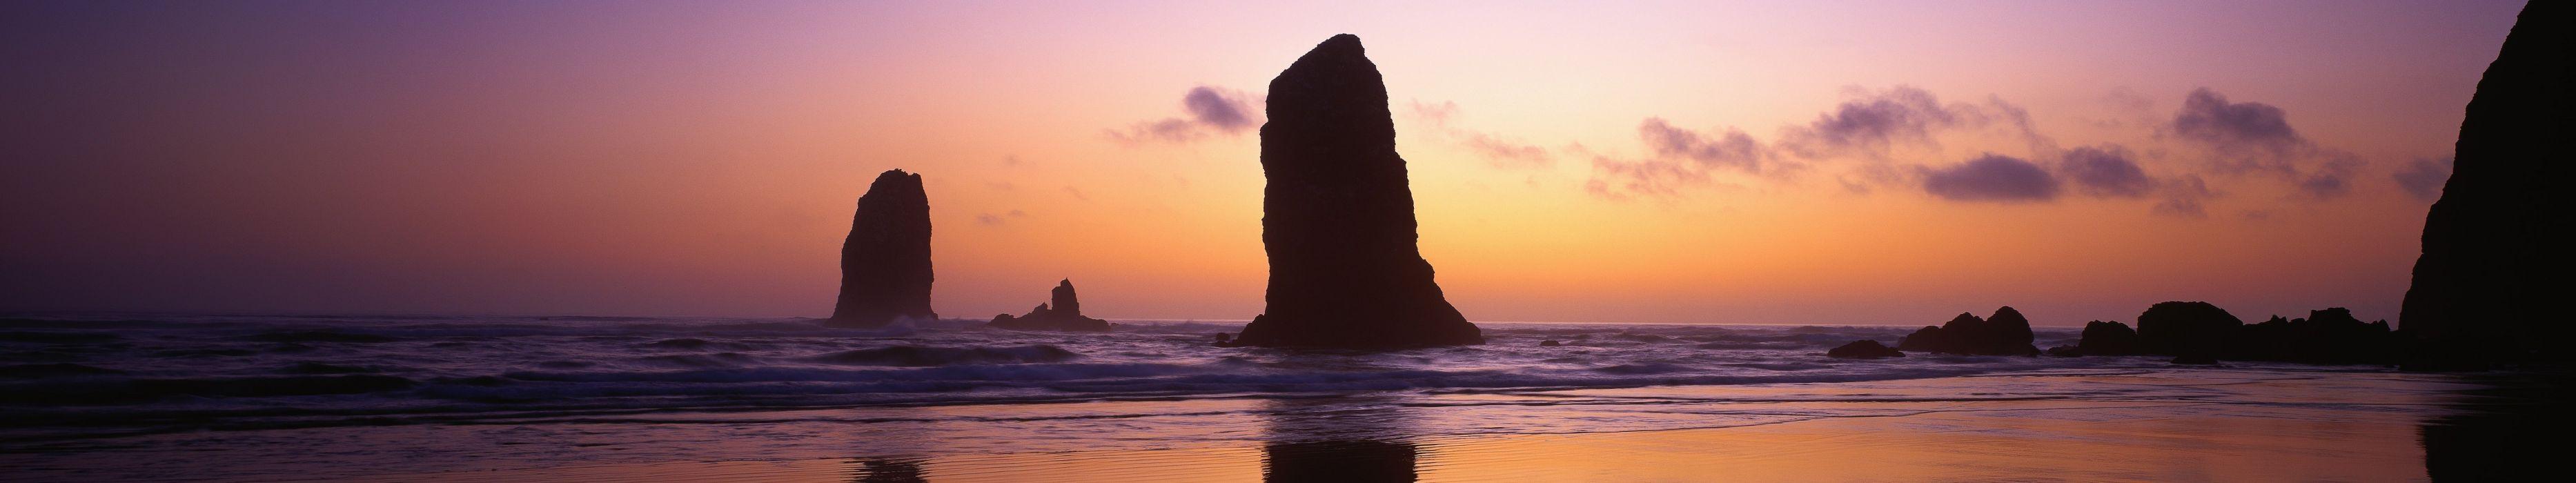 triple monitor multi screen multiple rock roche rocher coucher de soleil sunset plage beach wallpaper